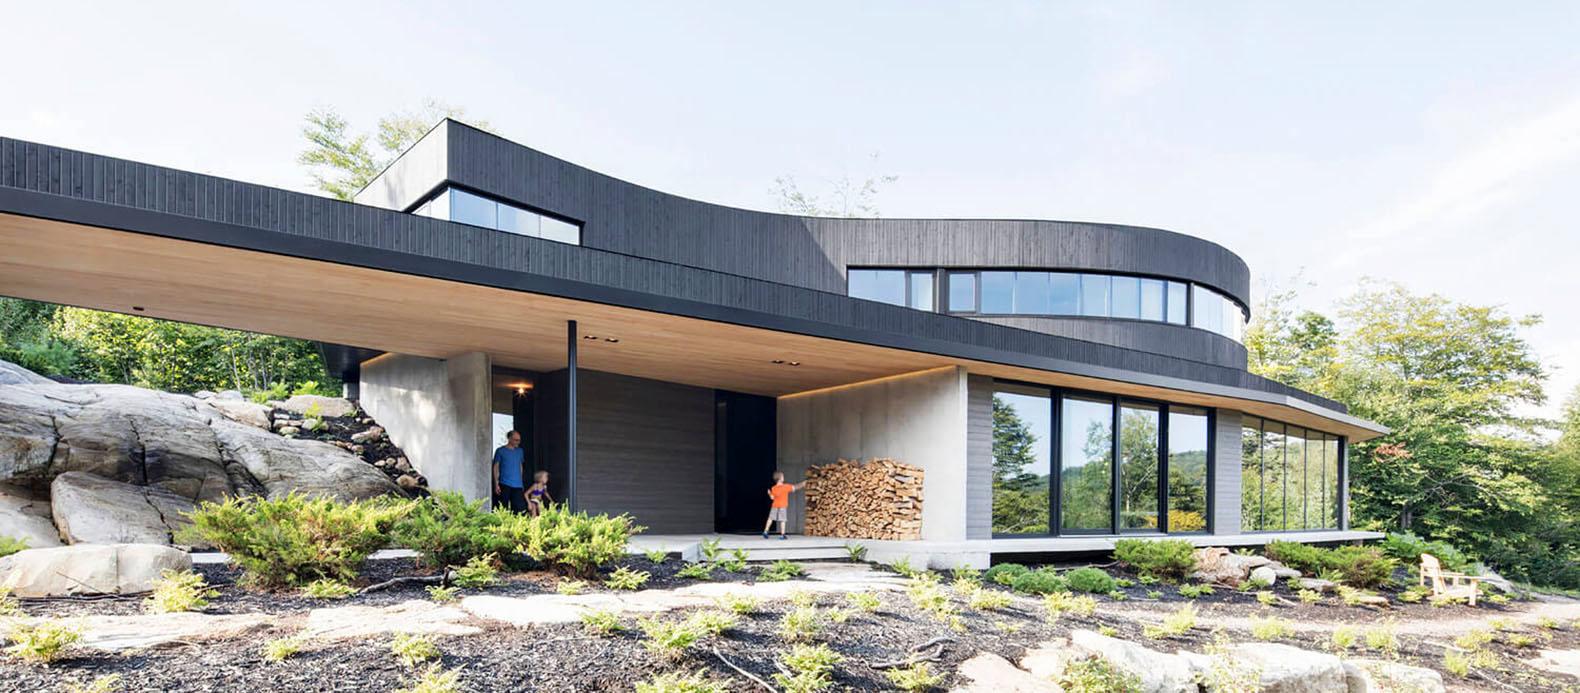 Best Kitchen Gallery: Off Grid Home Inhabitat Green Design Innovation Architecture of Off Grid Home Designs  on rachelxblog.com